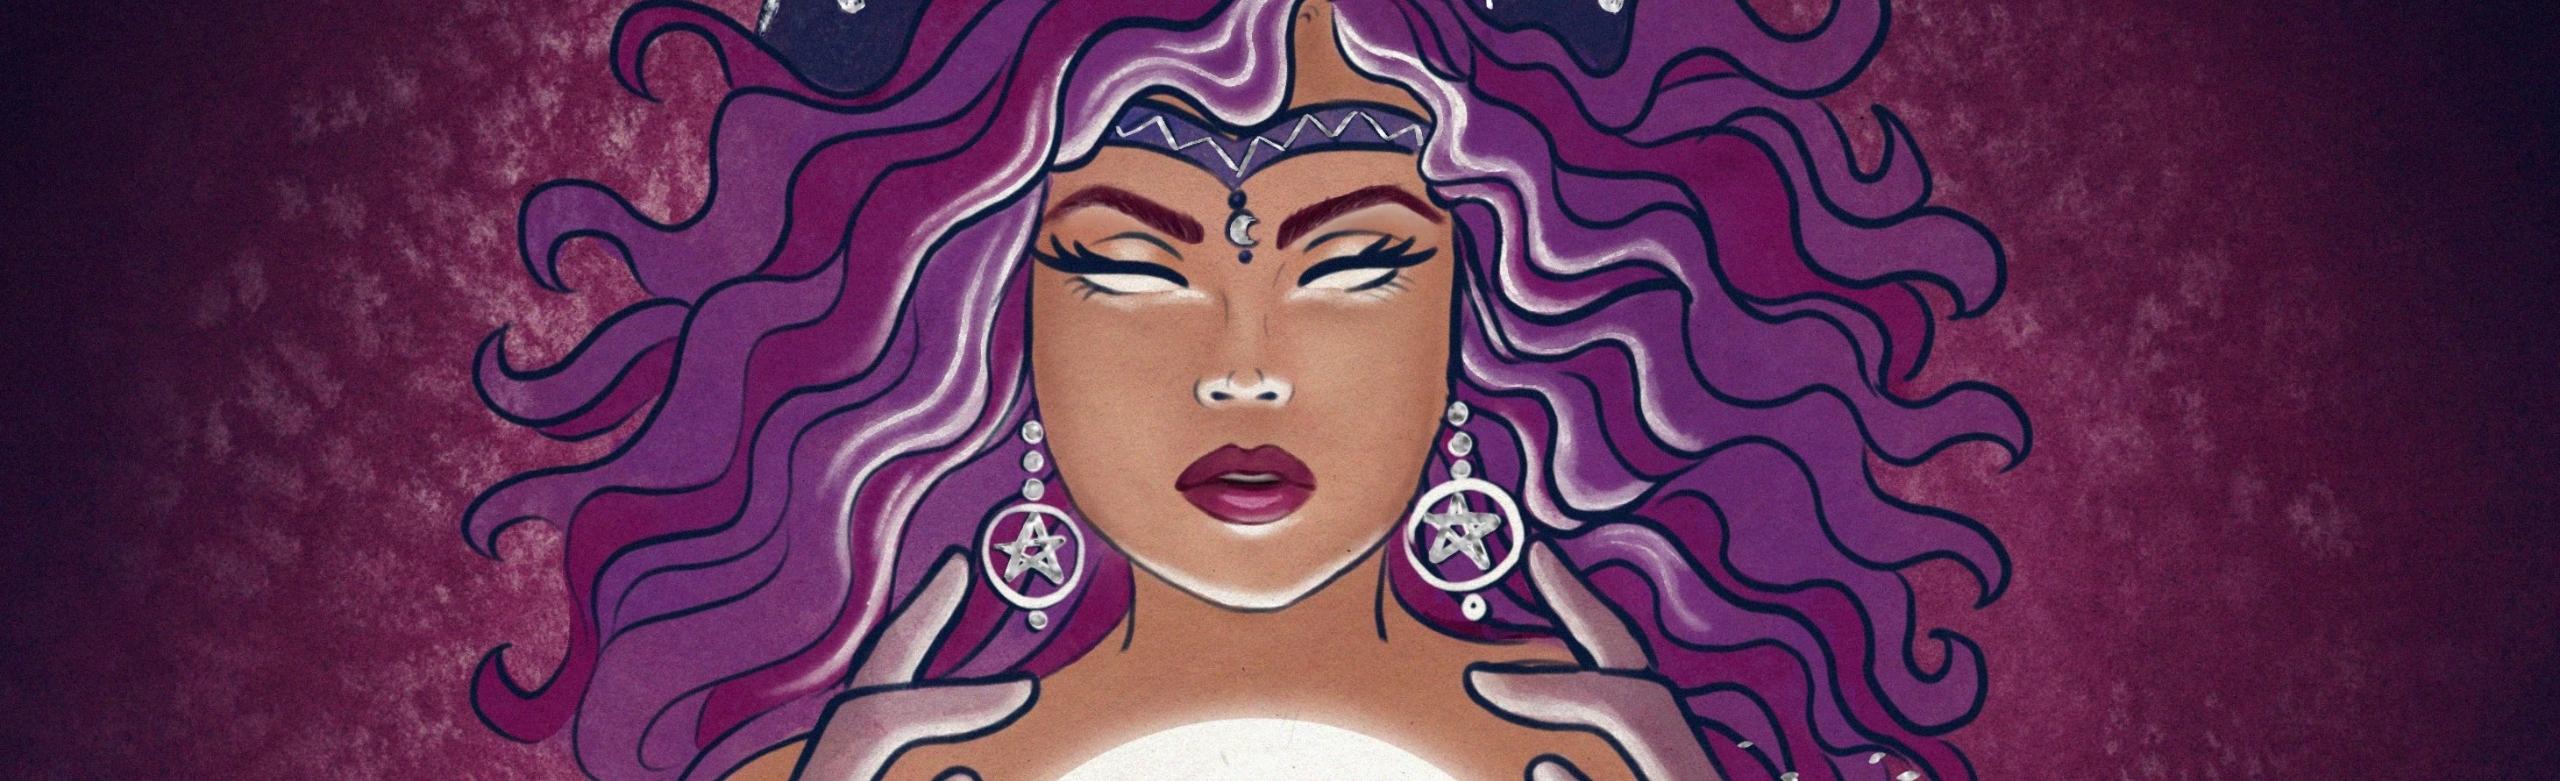 Melisa (@melisaura) Cover Image